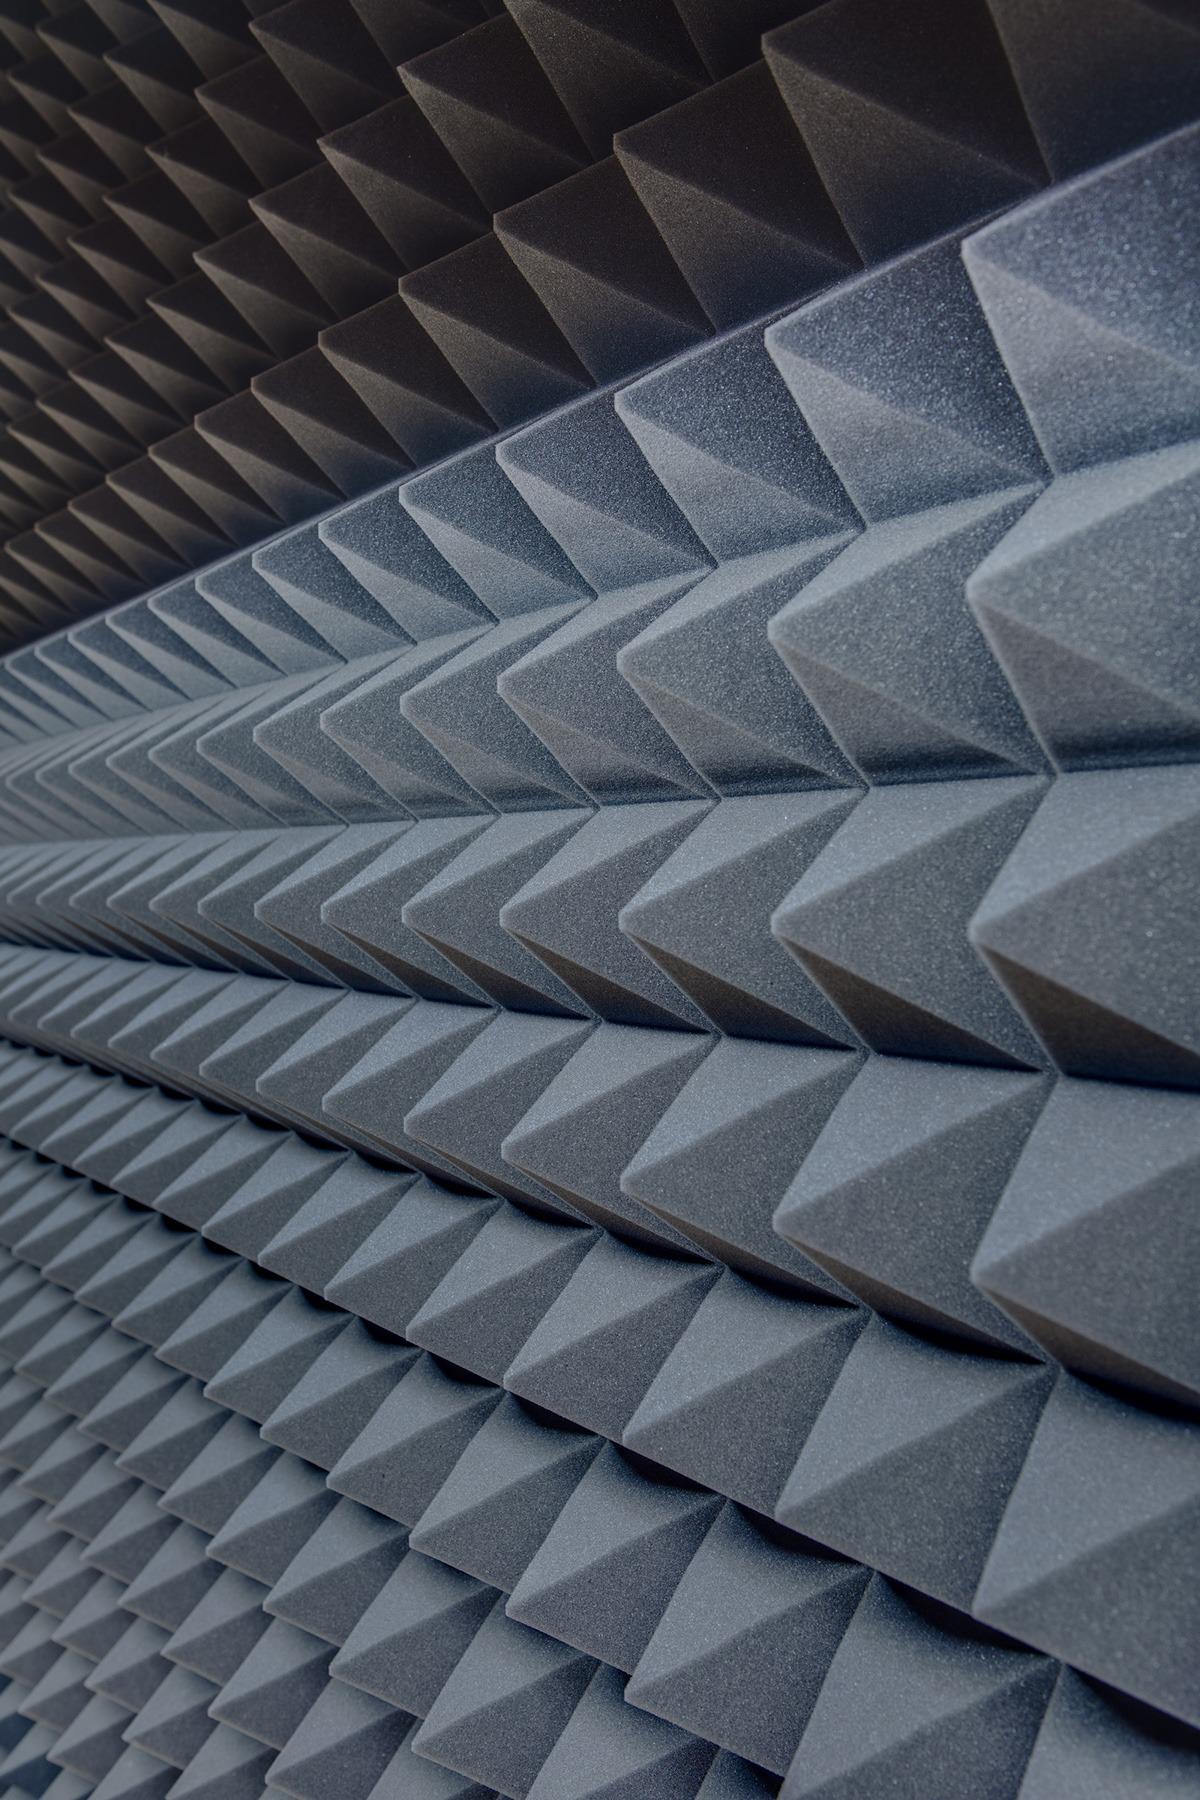 Sound Proofing Interior Design Ideas